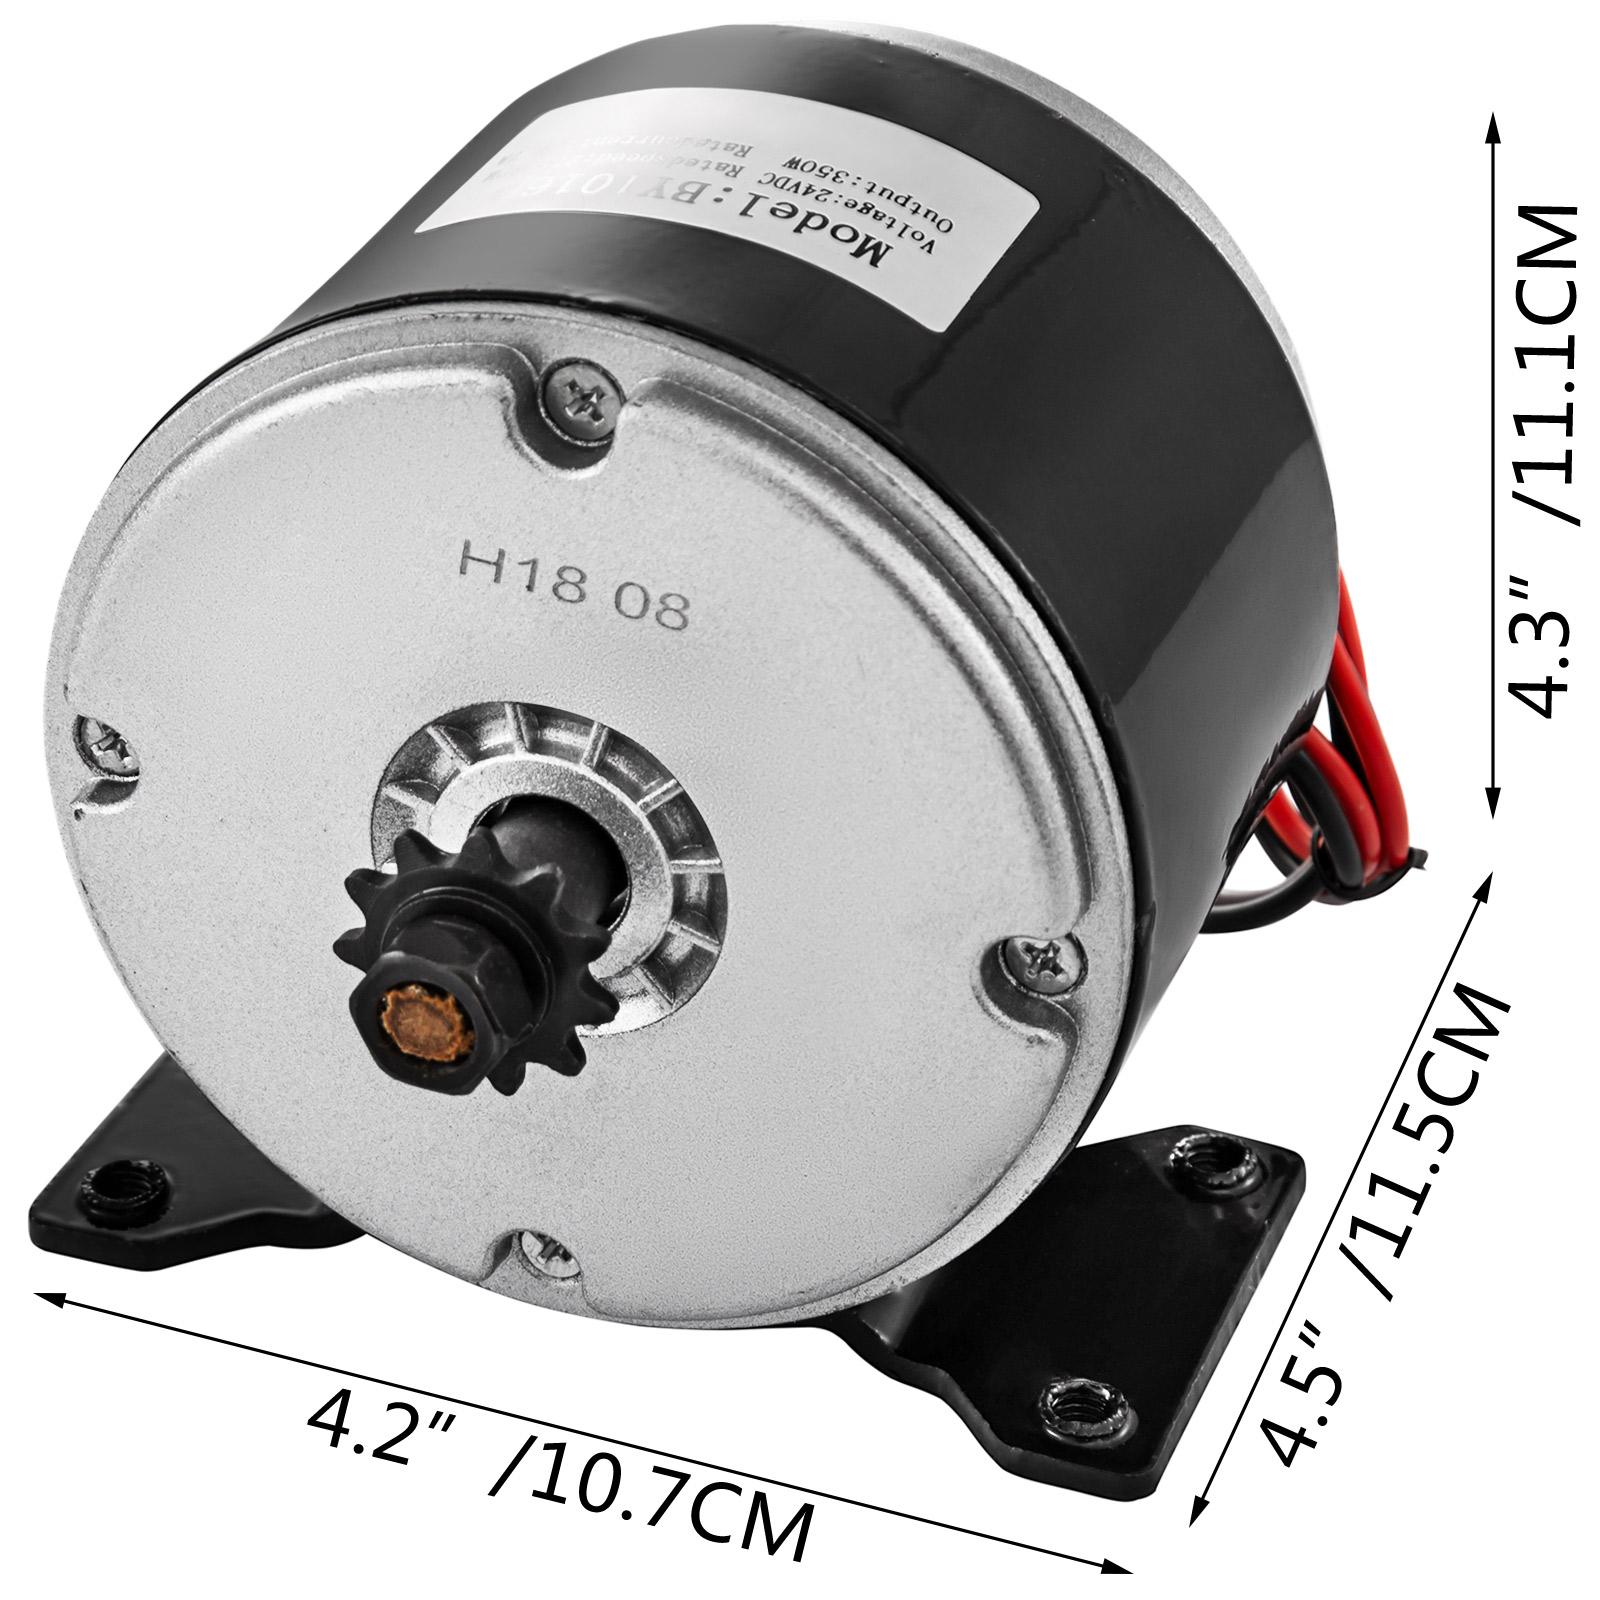 DC-electric-motor-12-60V-150W-2KW-for-scooter-bike-go-kart-minibike-e-ATV thumbnail 32